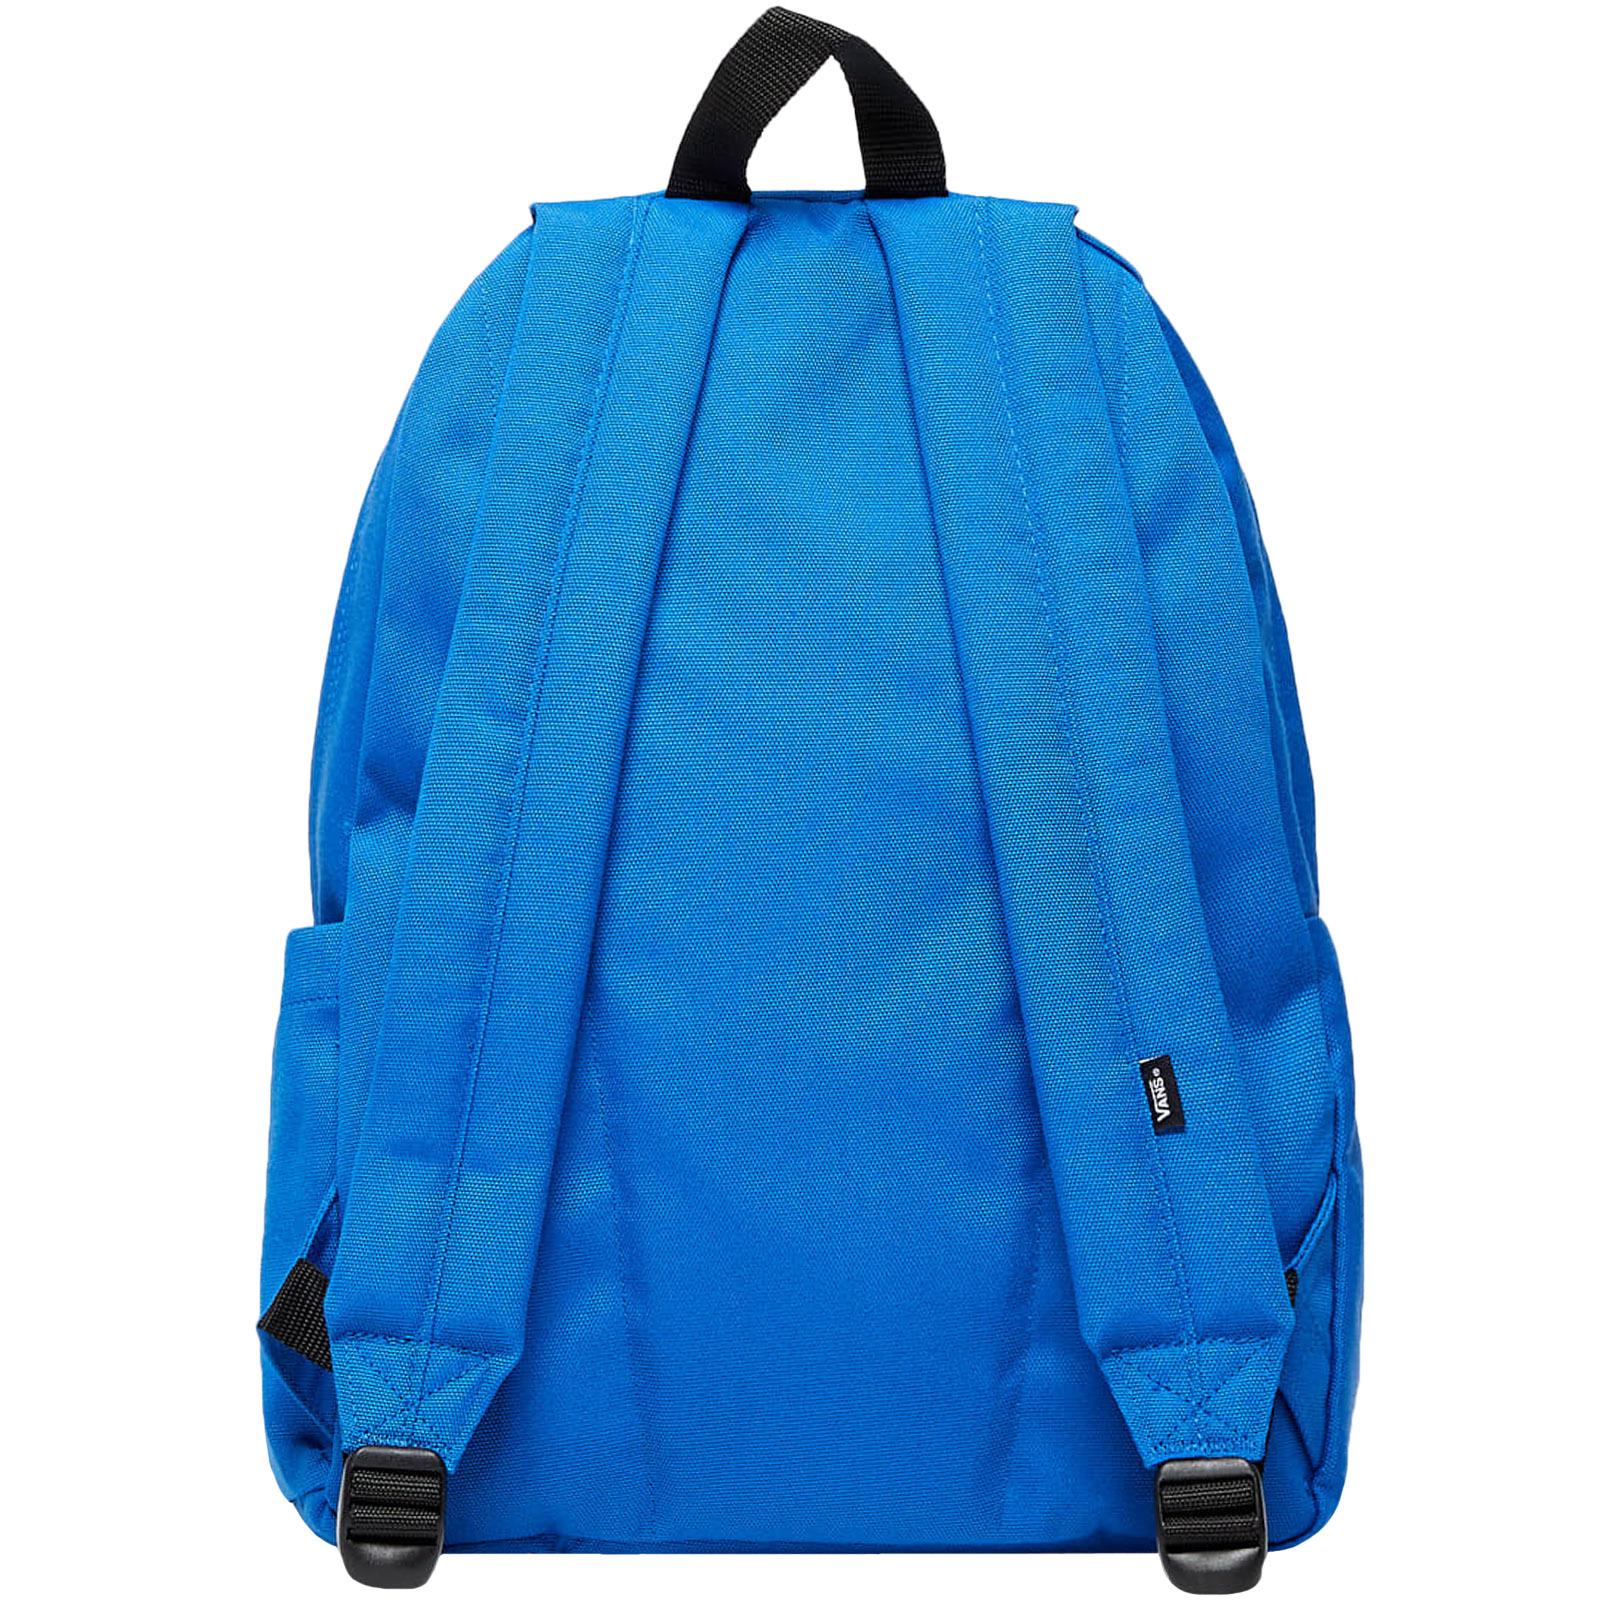 thumbnail 5 - Vans Unisex Old Skool Drop Adjustable Strap School Travel Rucksack Backpack Bag